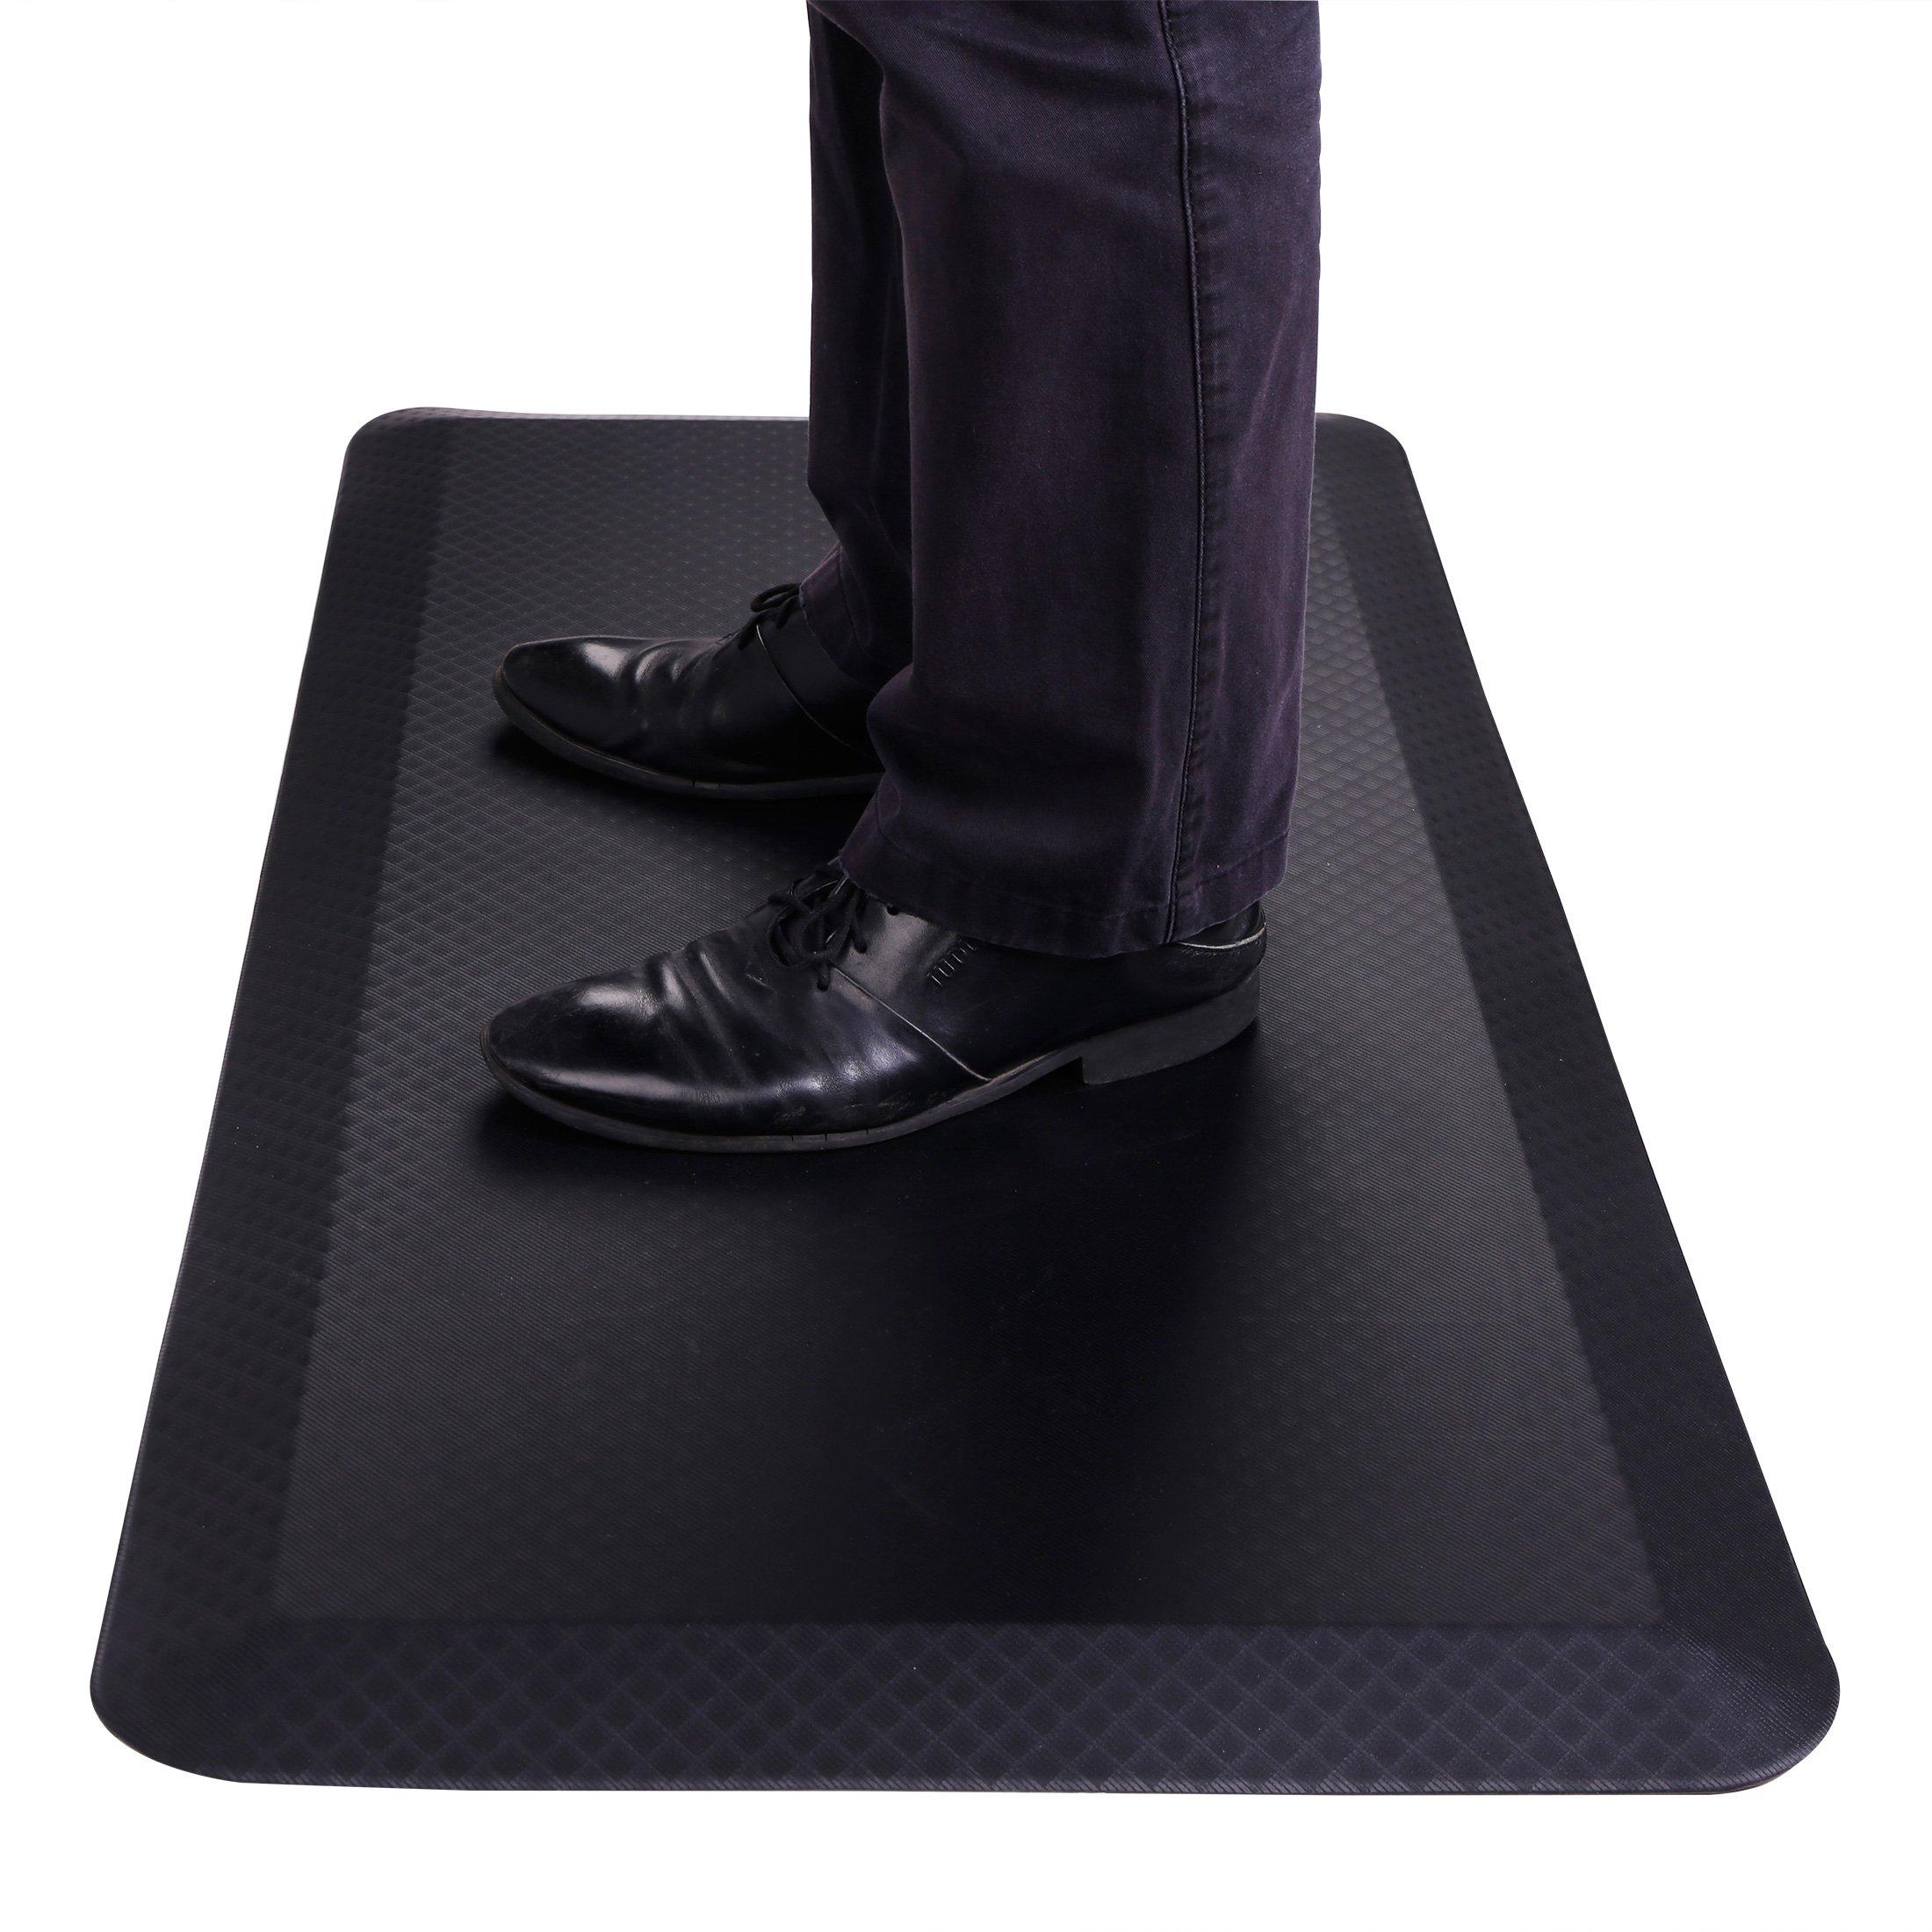 FlexiSpot Standing Desk Mat 20 in x 39 in Non-Slip